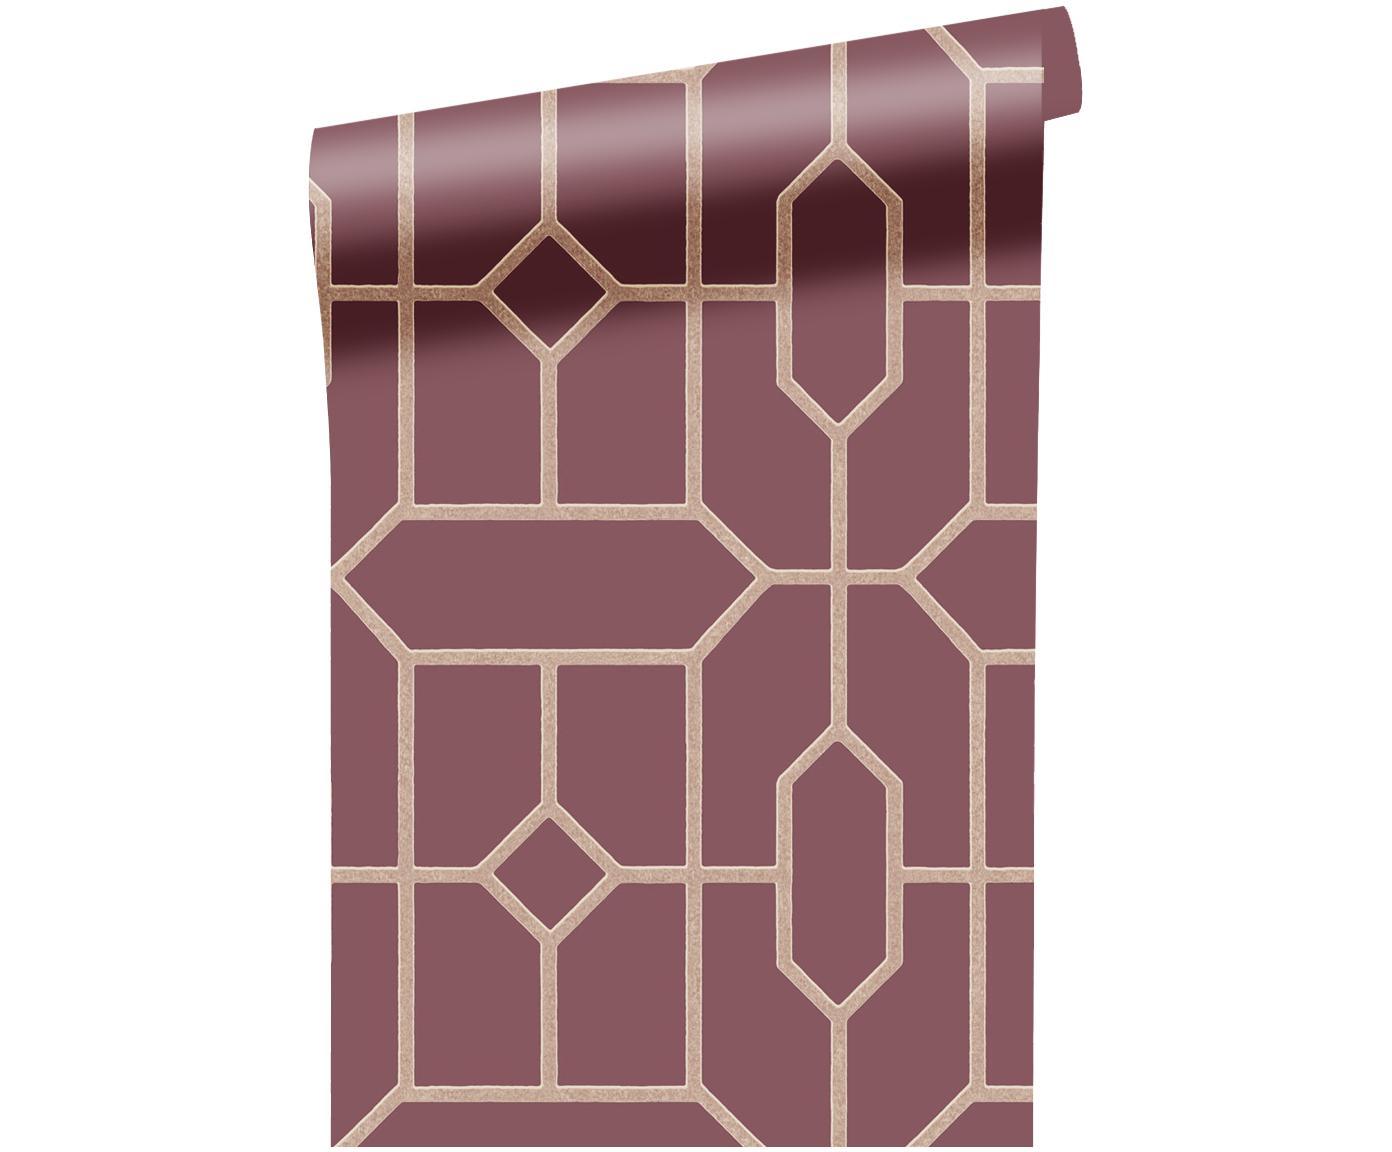 Tapete Geometric, Vlies, glatt, Bordeaux, Beige, 52 x 1000 cm